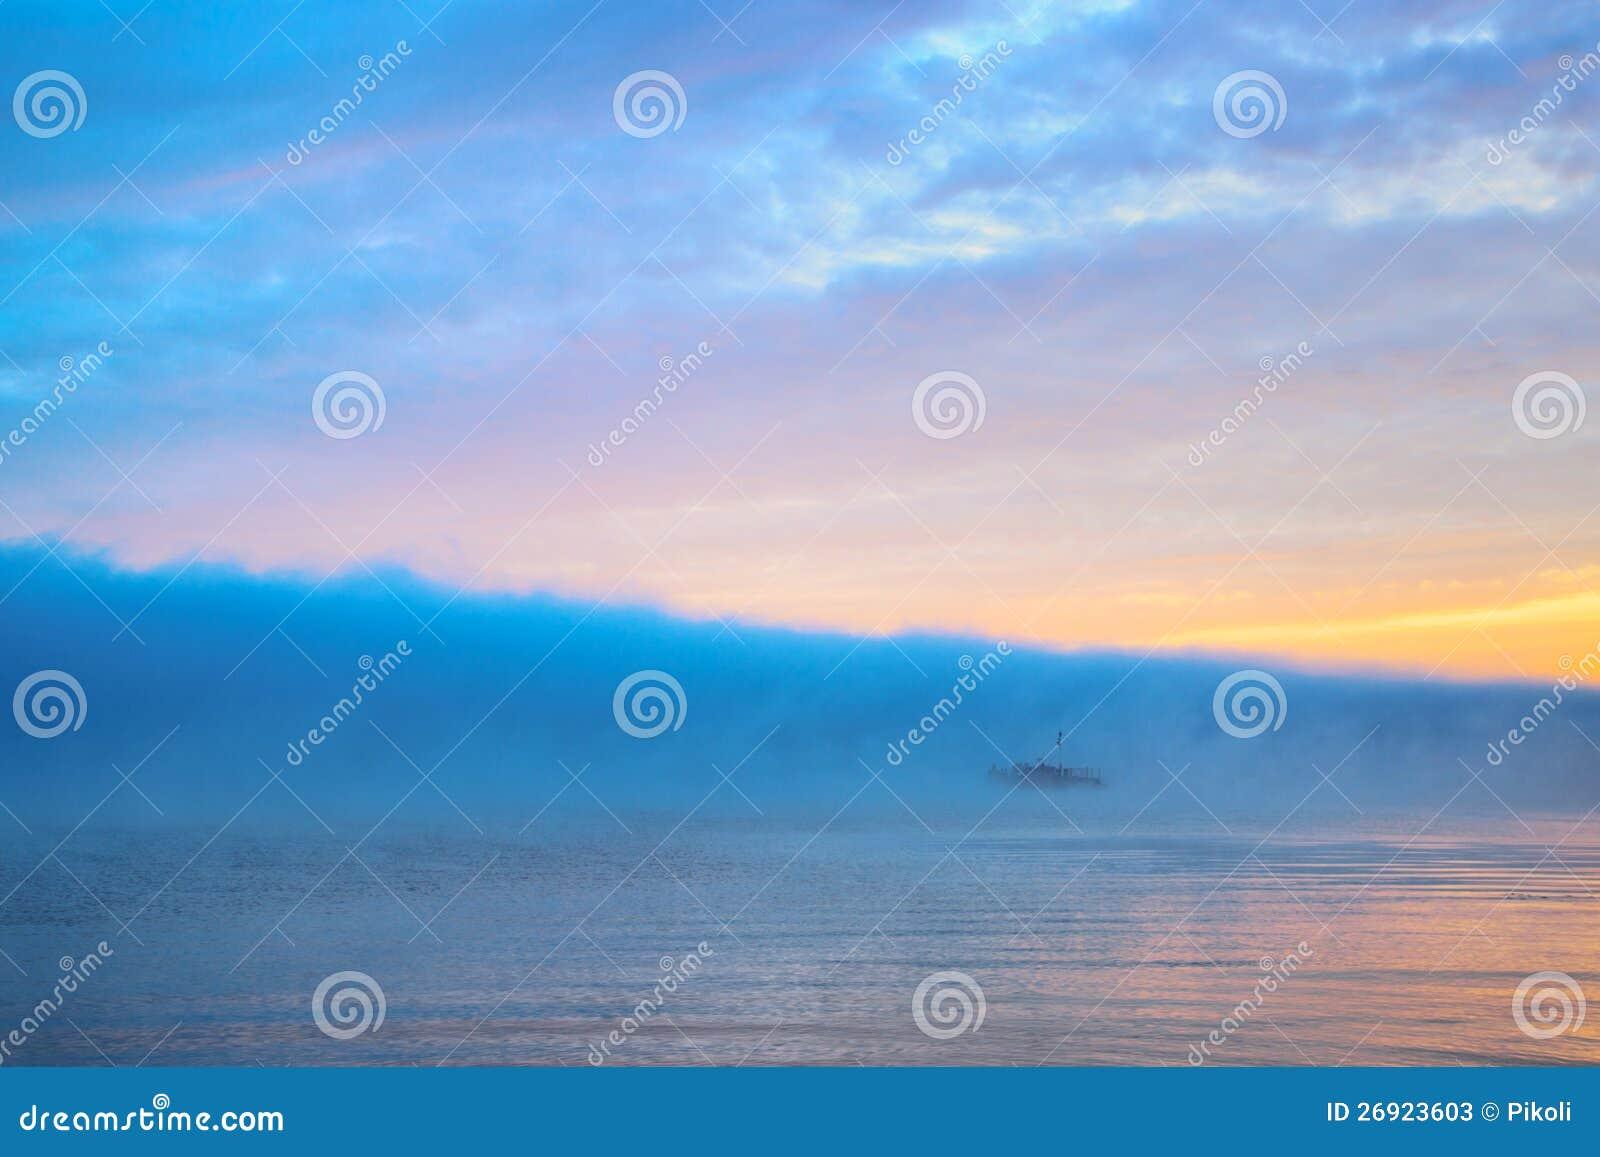 Чудесное река с большим облаком голубого тумана